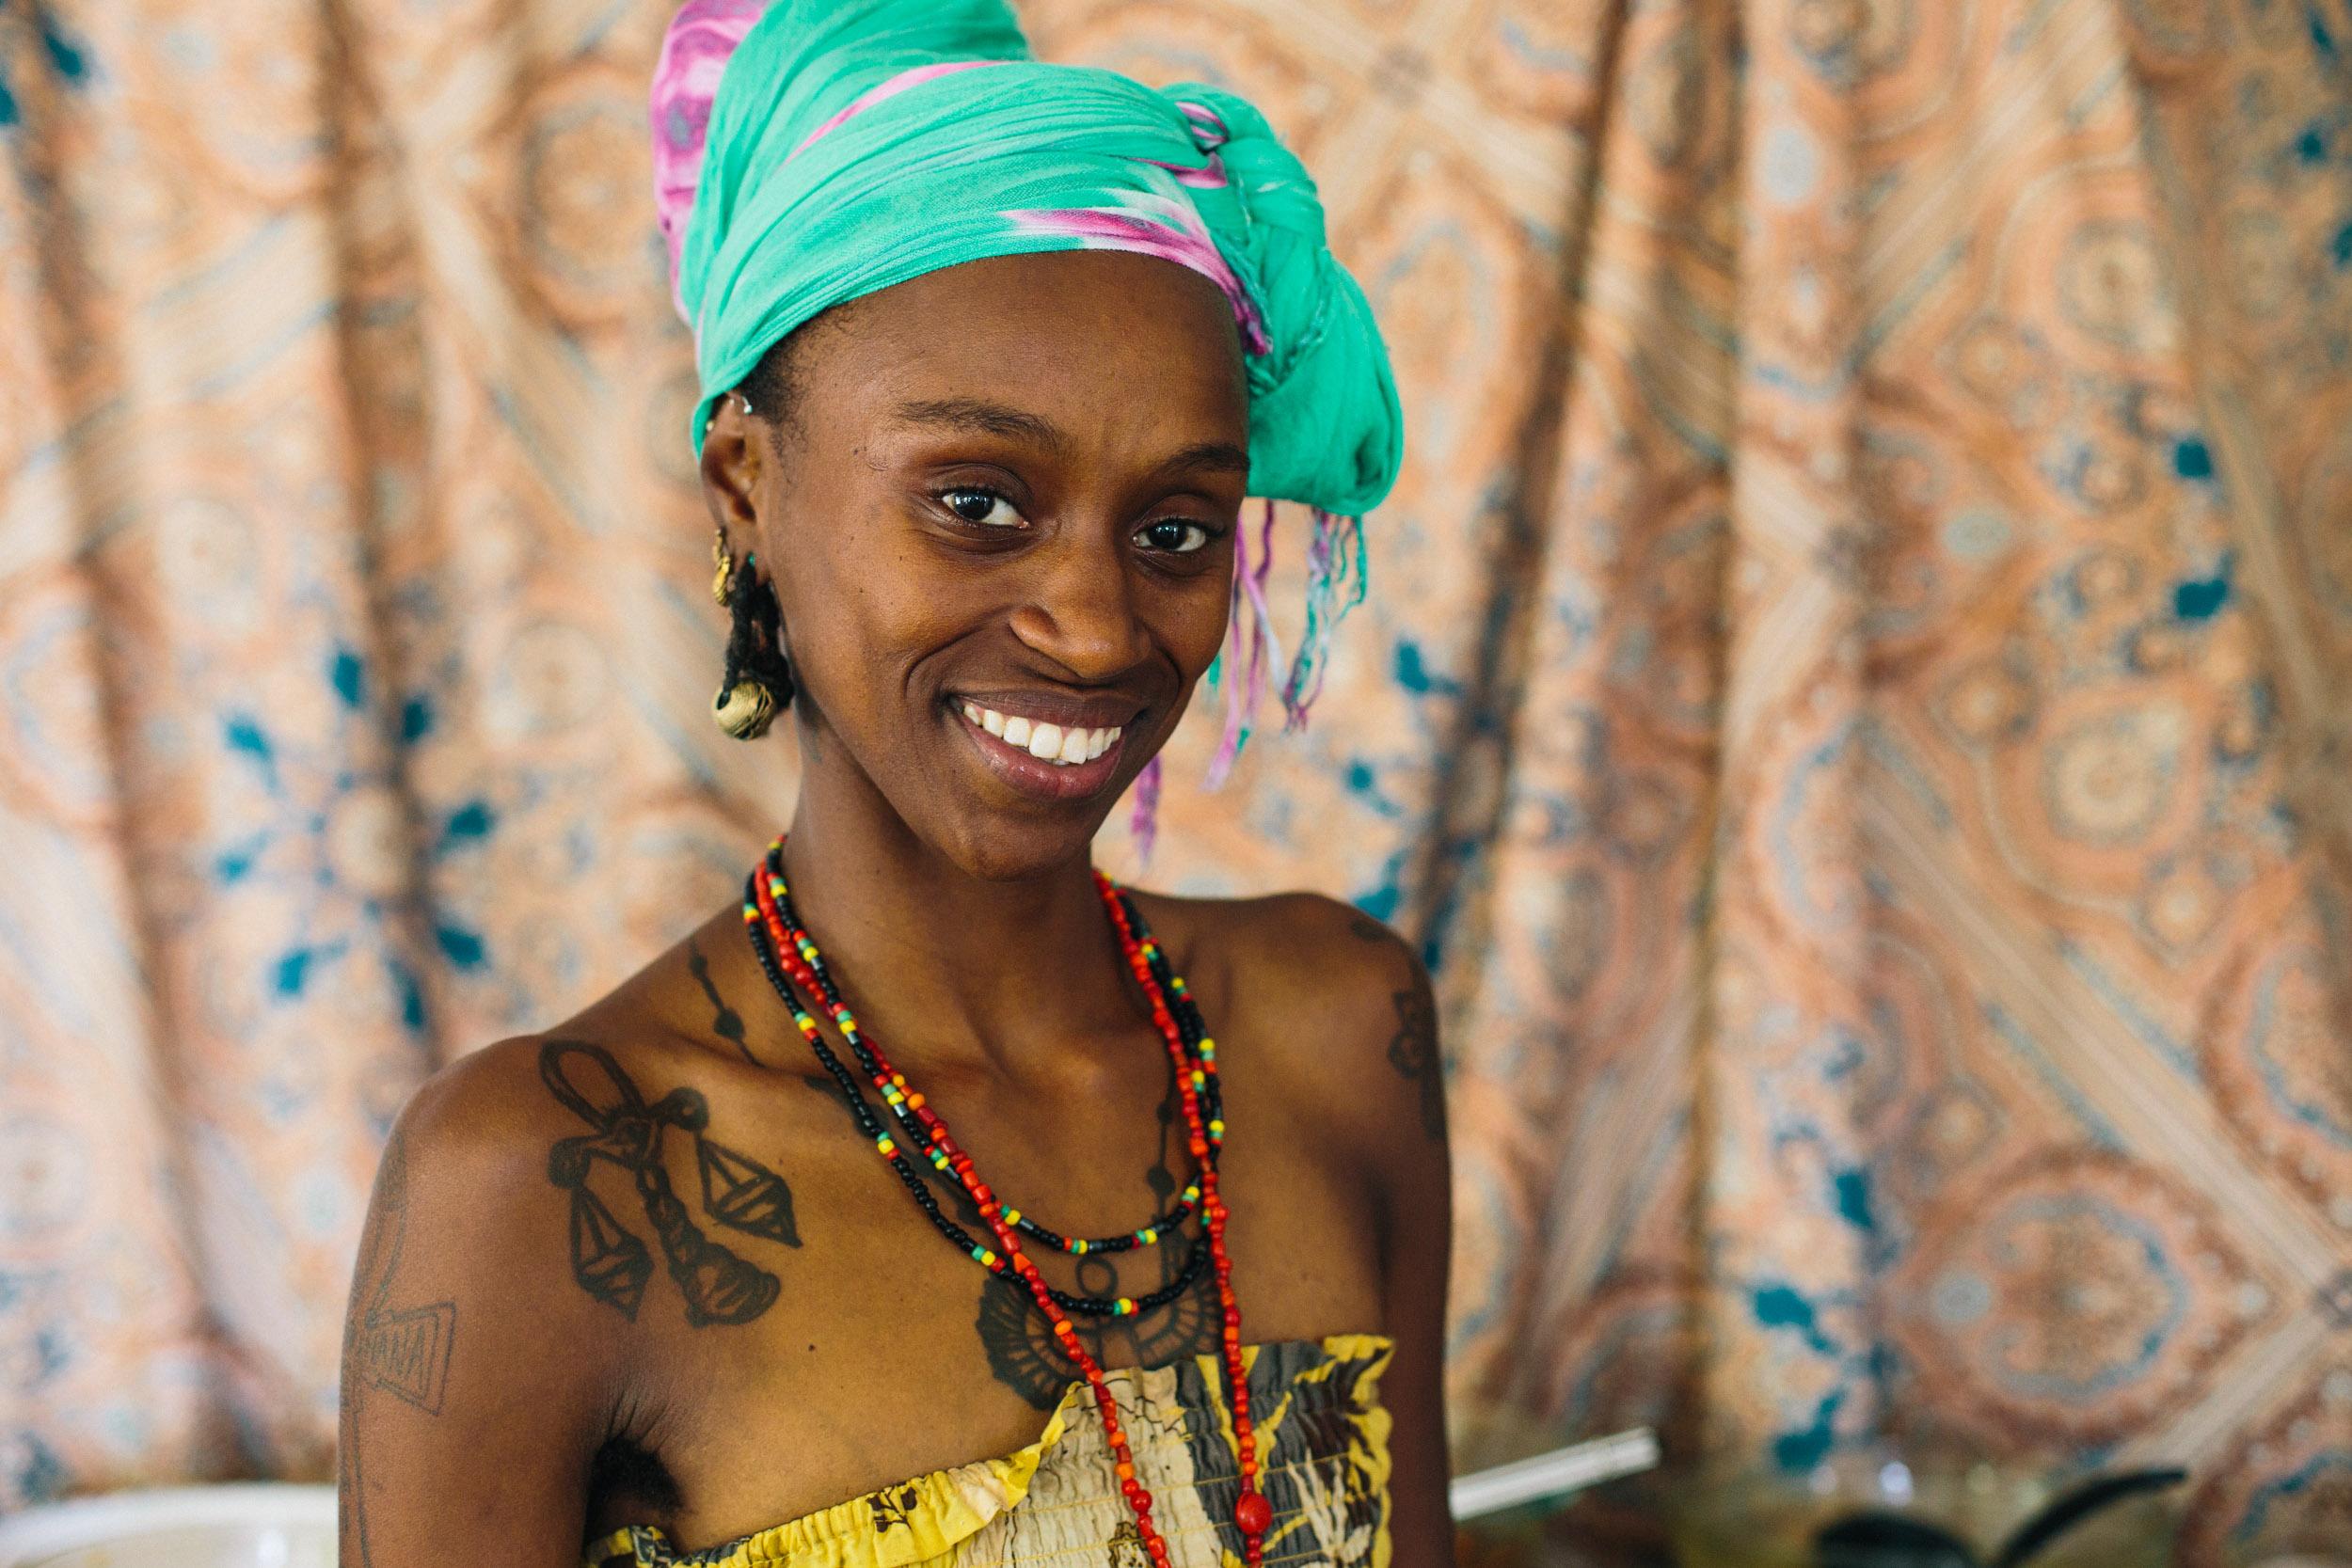 jimmy-rowalt-portrait-photography-new-orleans-sister-princess-001.jpg